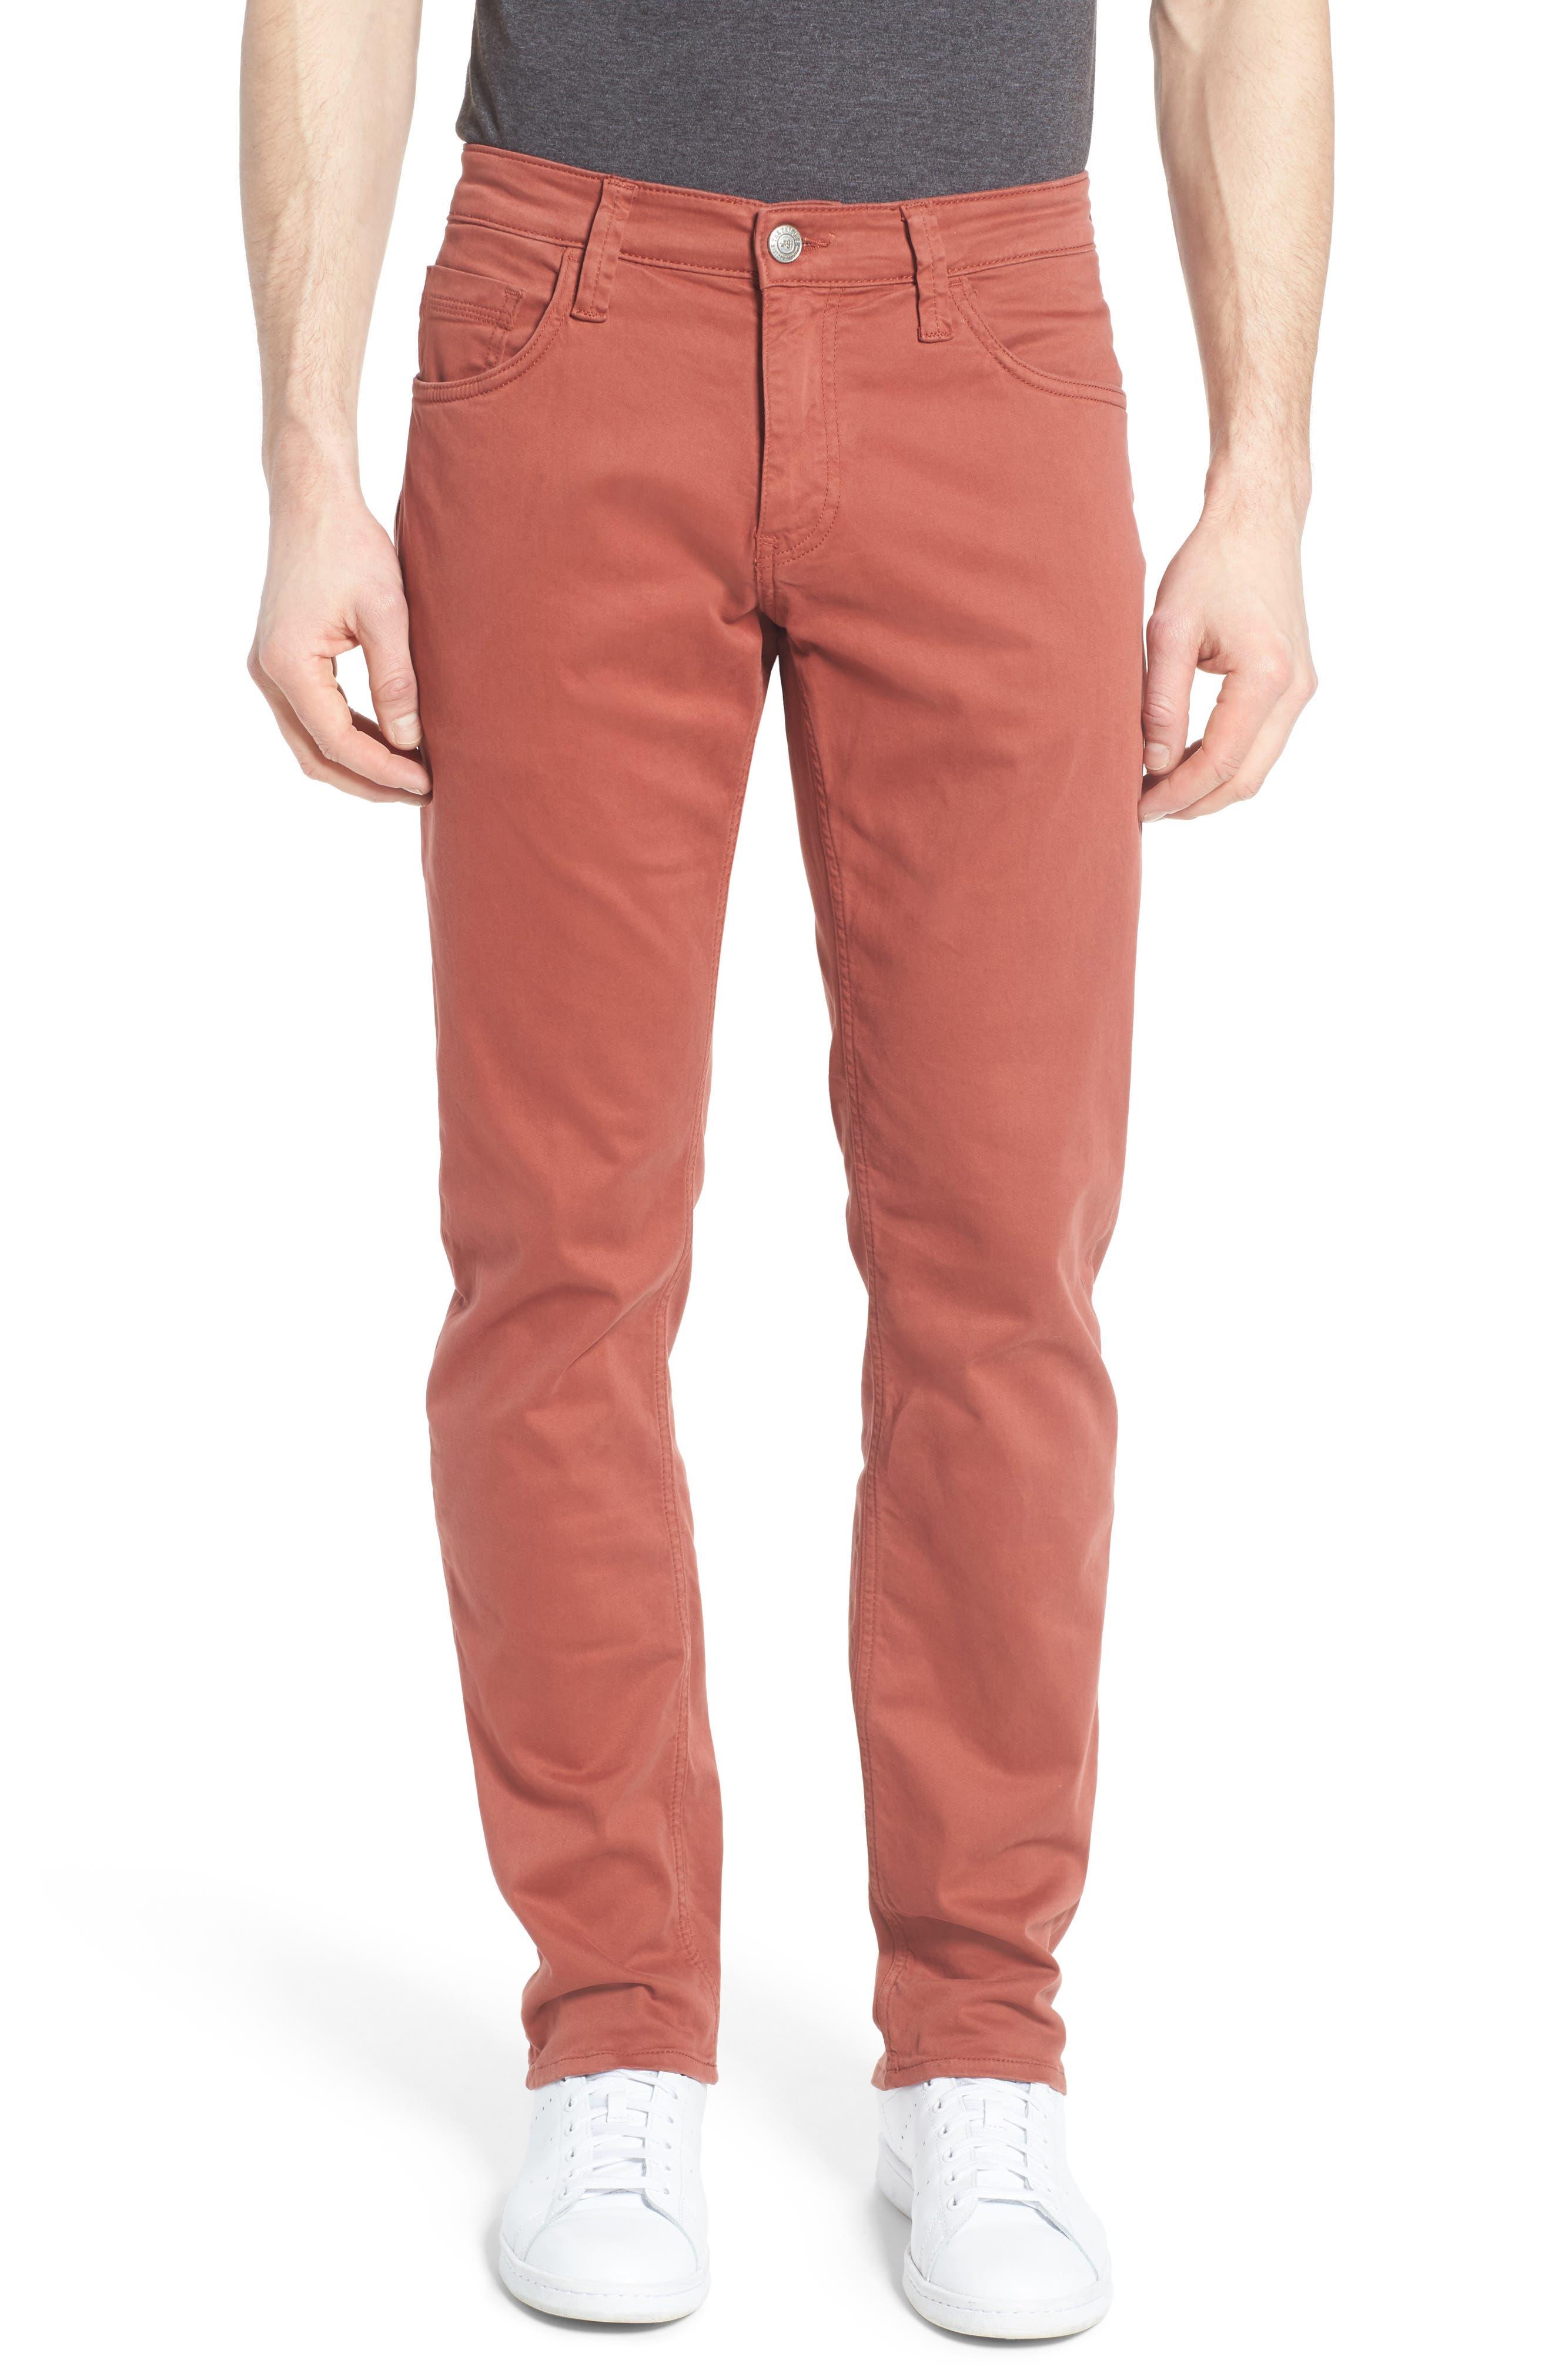 Zach Straight Leg Jeans,                         Main,                         color, 600